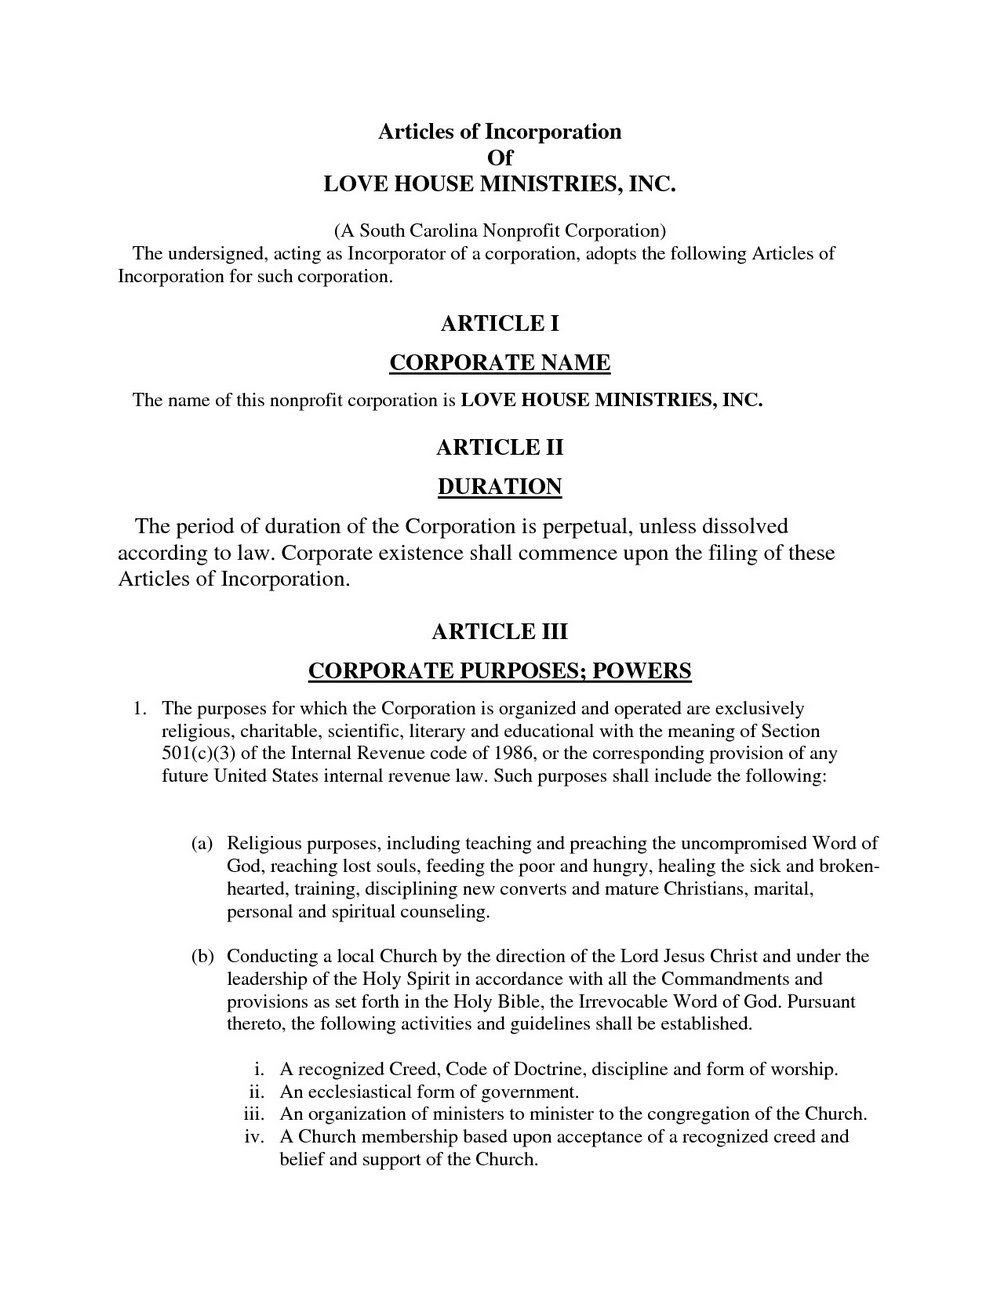 Llc Articles Of Organization Template Free